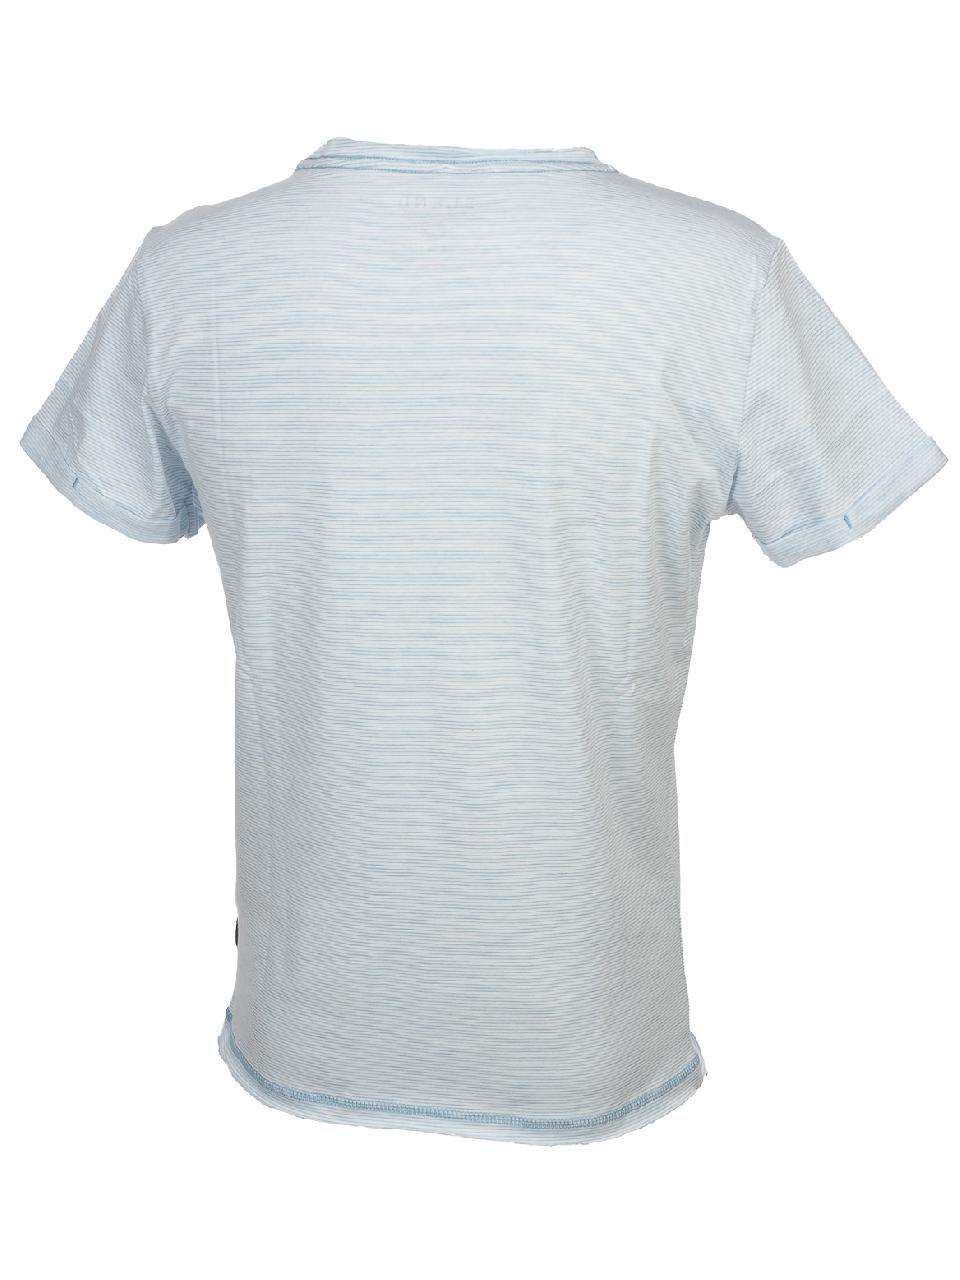 Short-Sleeve-T-Shirt-Blend-Prisco-Steel-Blue-Mc-Tee-Blue-52992-New thumbnail 5